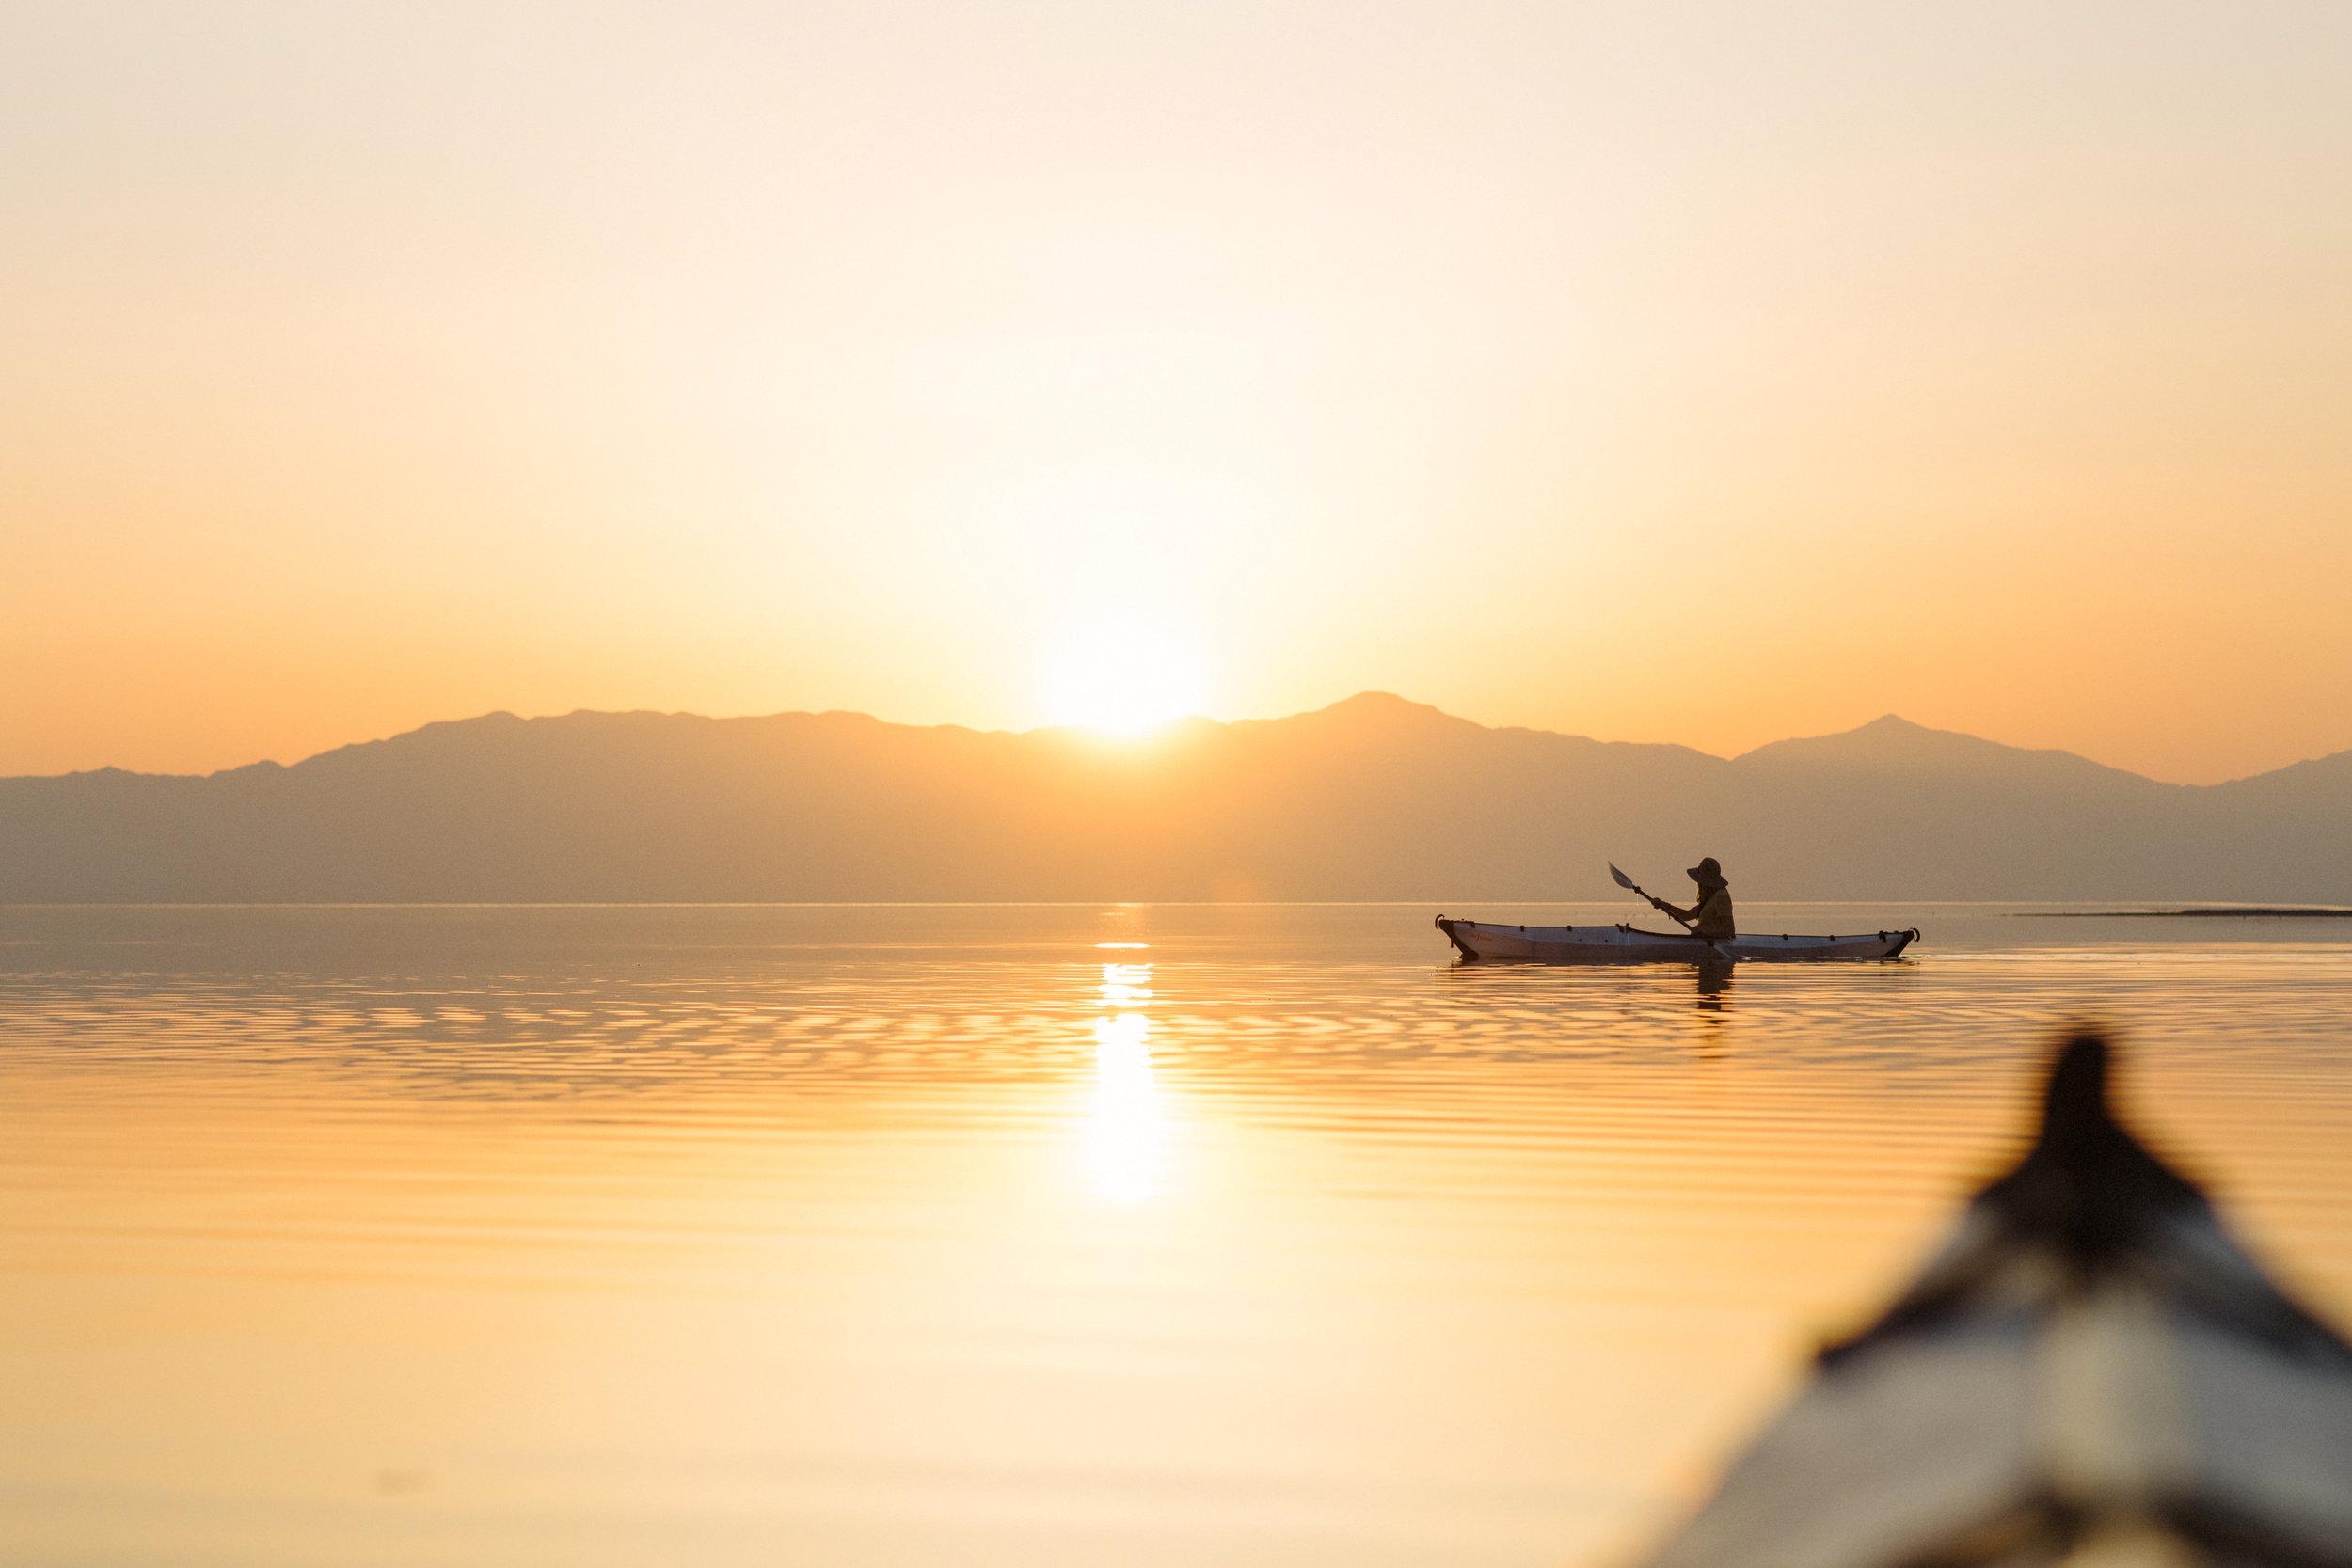 04:11 — Balkin_Oru Kayak_Salton Sea-0028.jpg